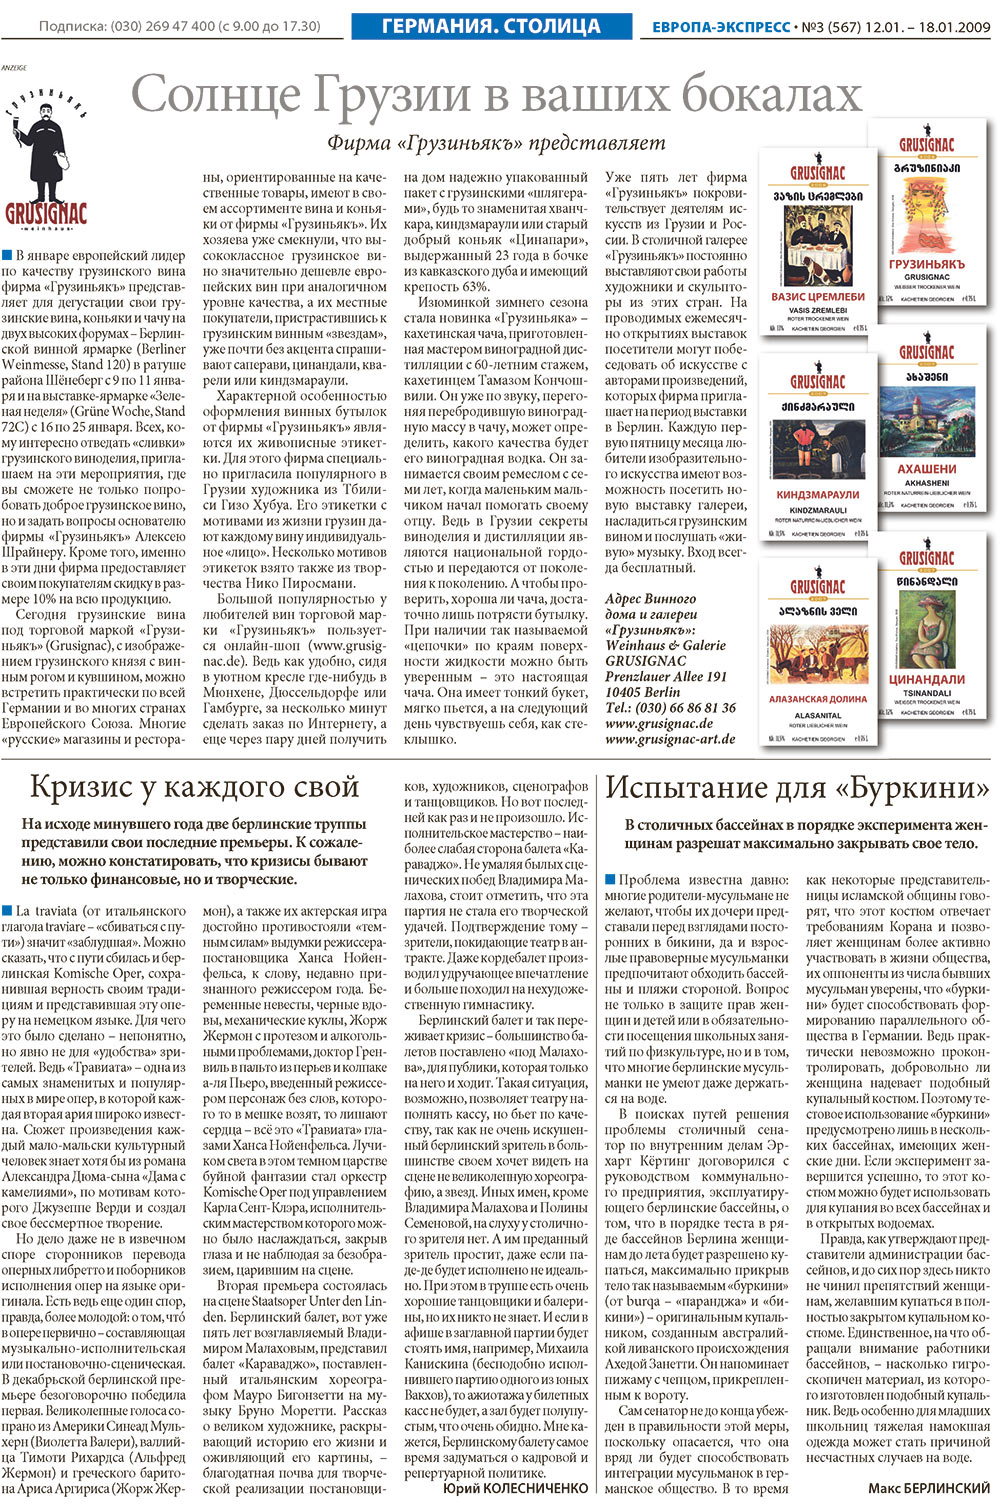 Европа экспресс (газета). 2009 год, номер 1, стр. 6